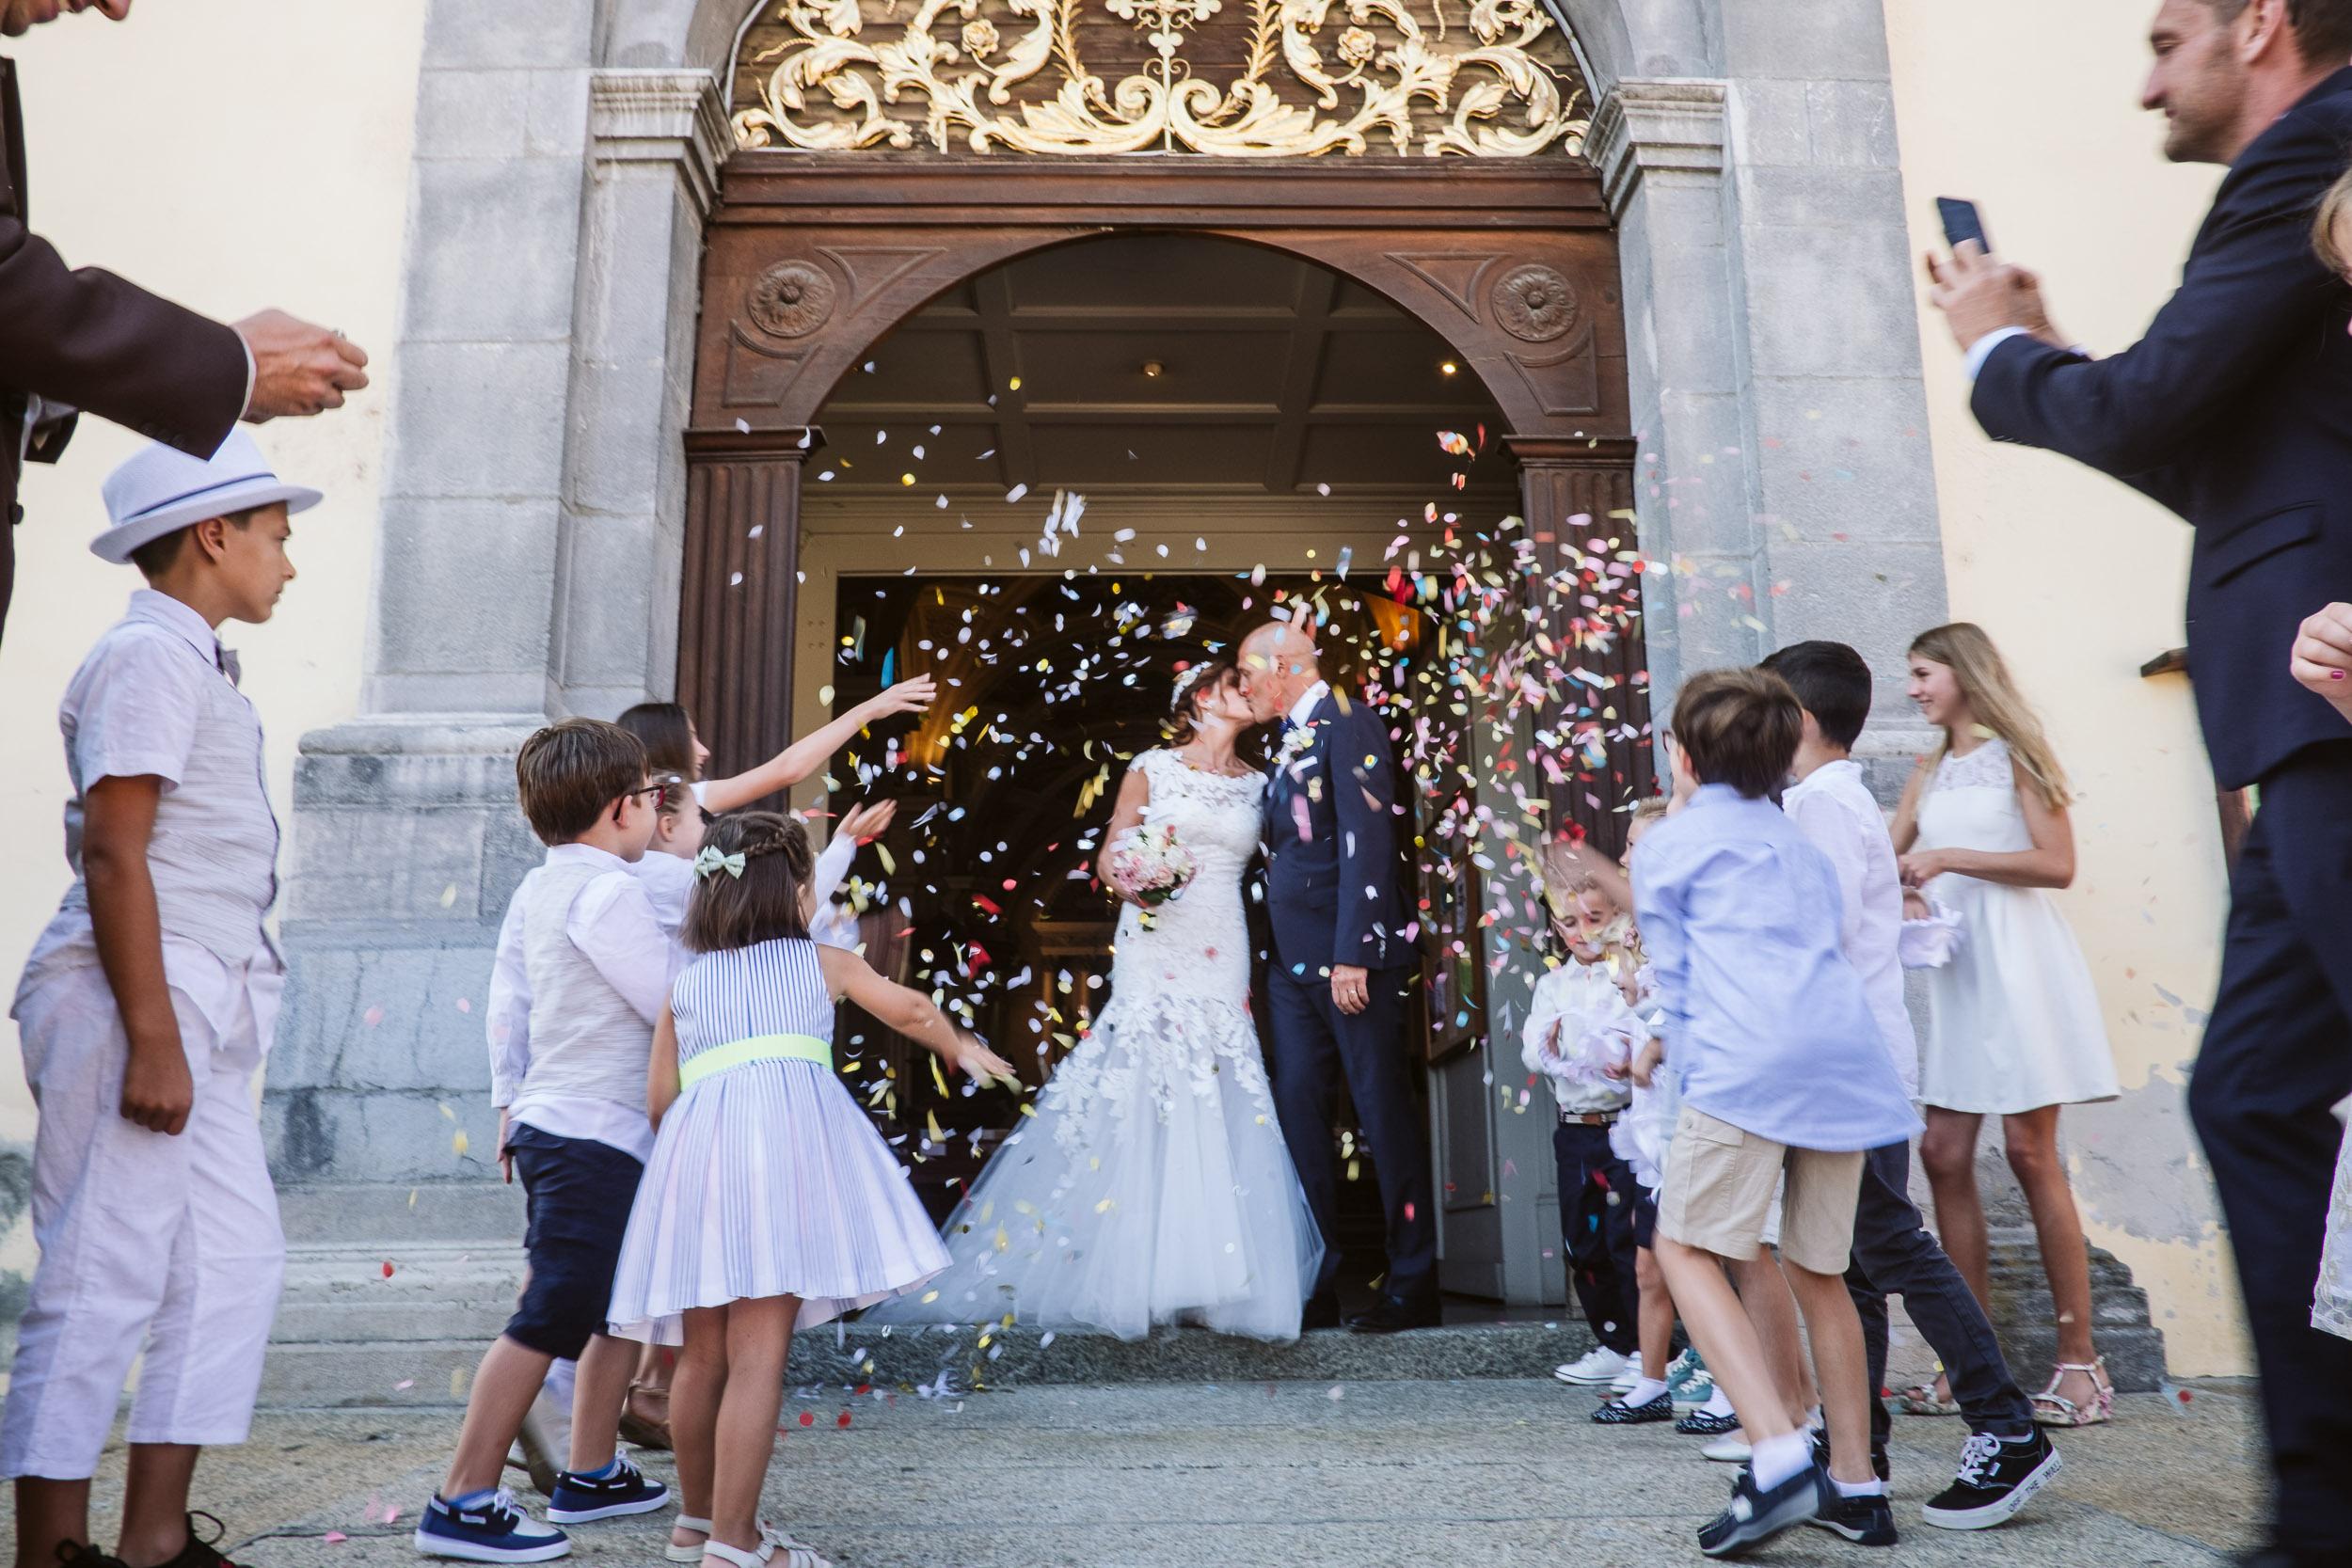 gerald-mattel-photographe-mariage-sallanches-9.jpg